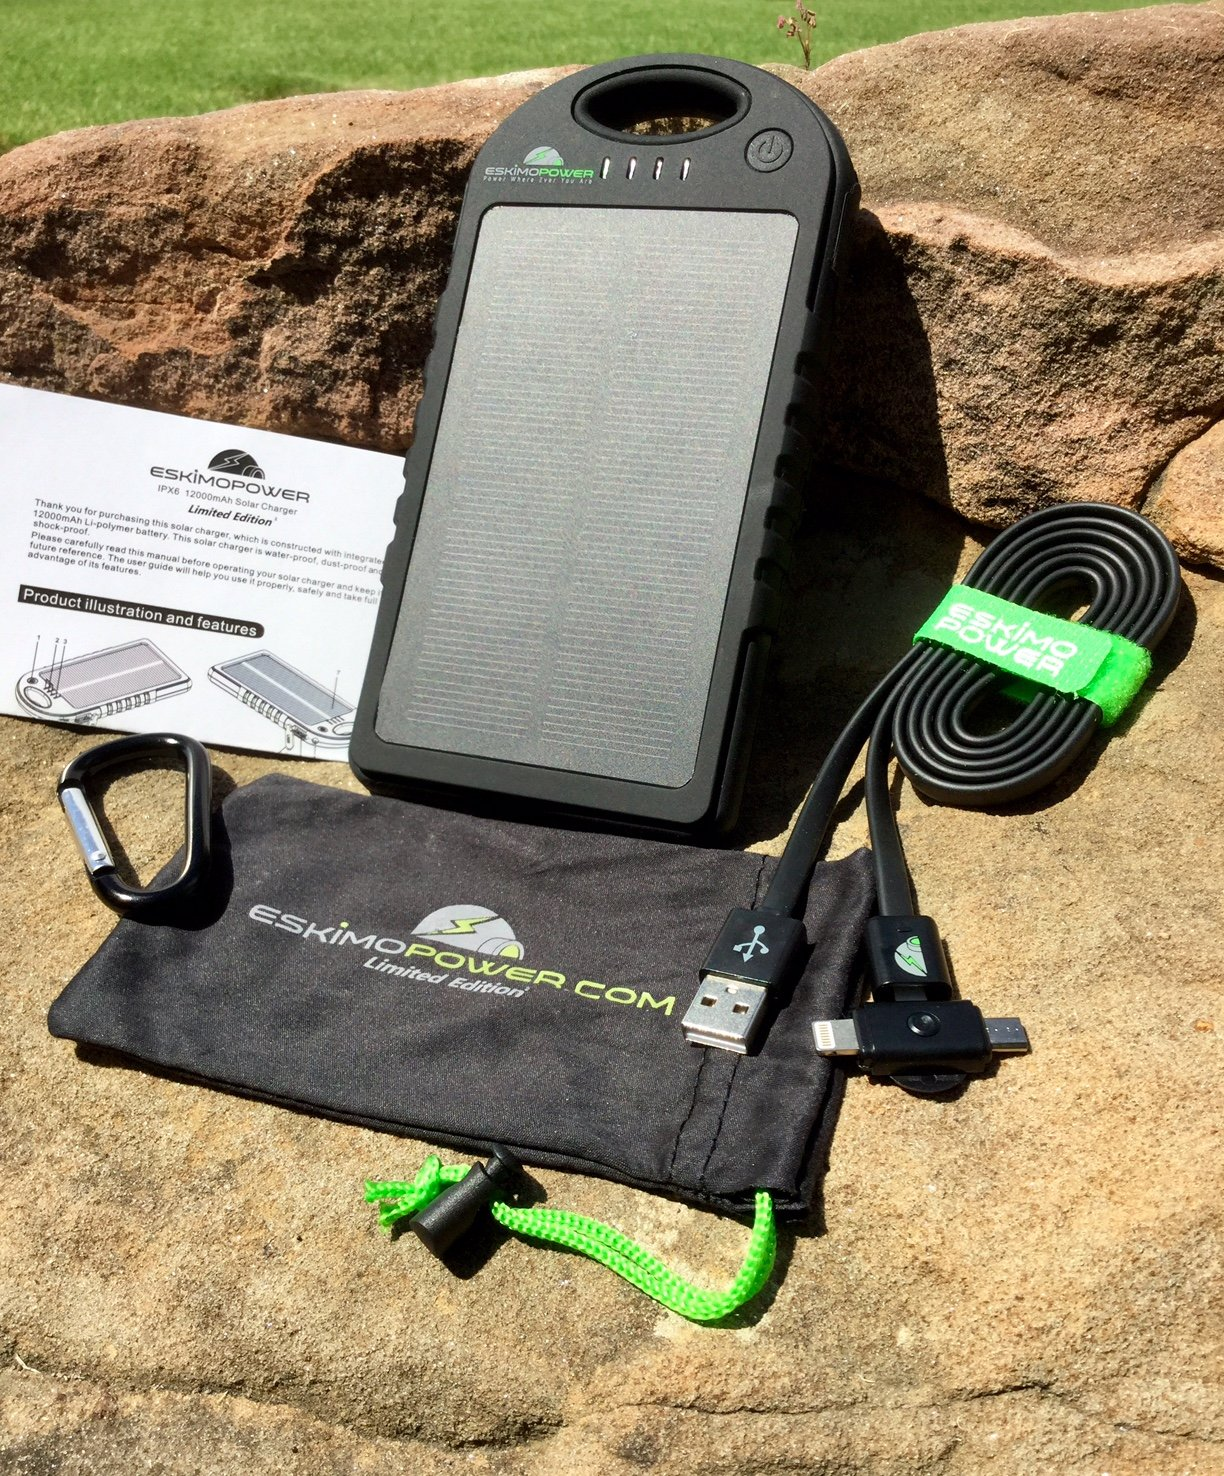 Amazon.com: Solar Phone Charger with 12000 mah Power Bank, BONUS 2 ...